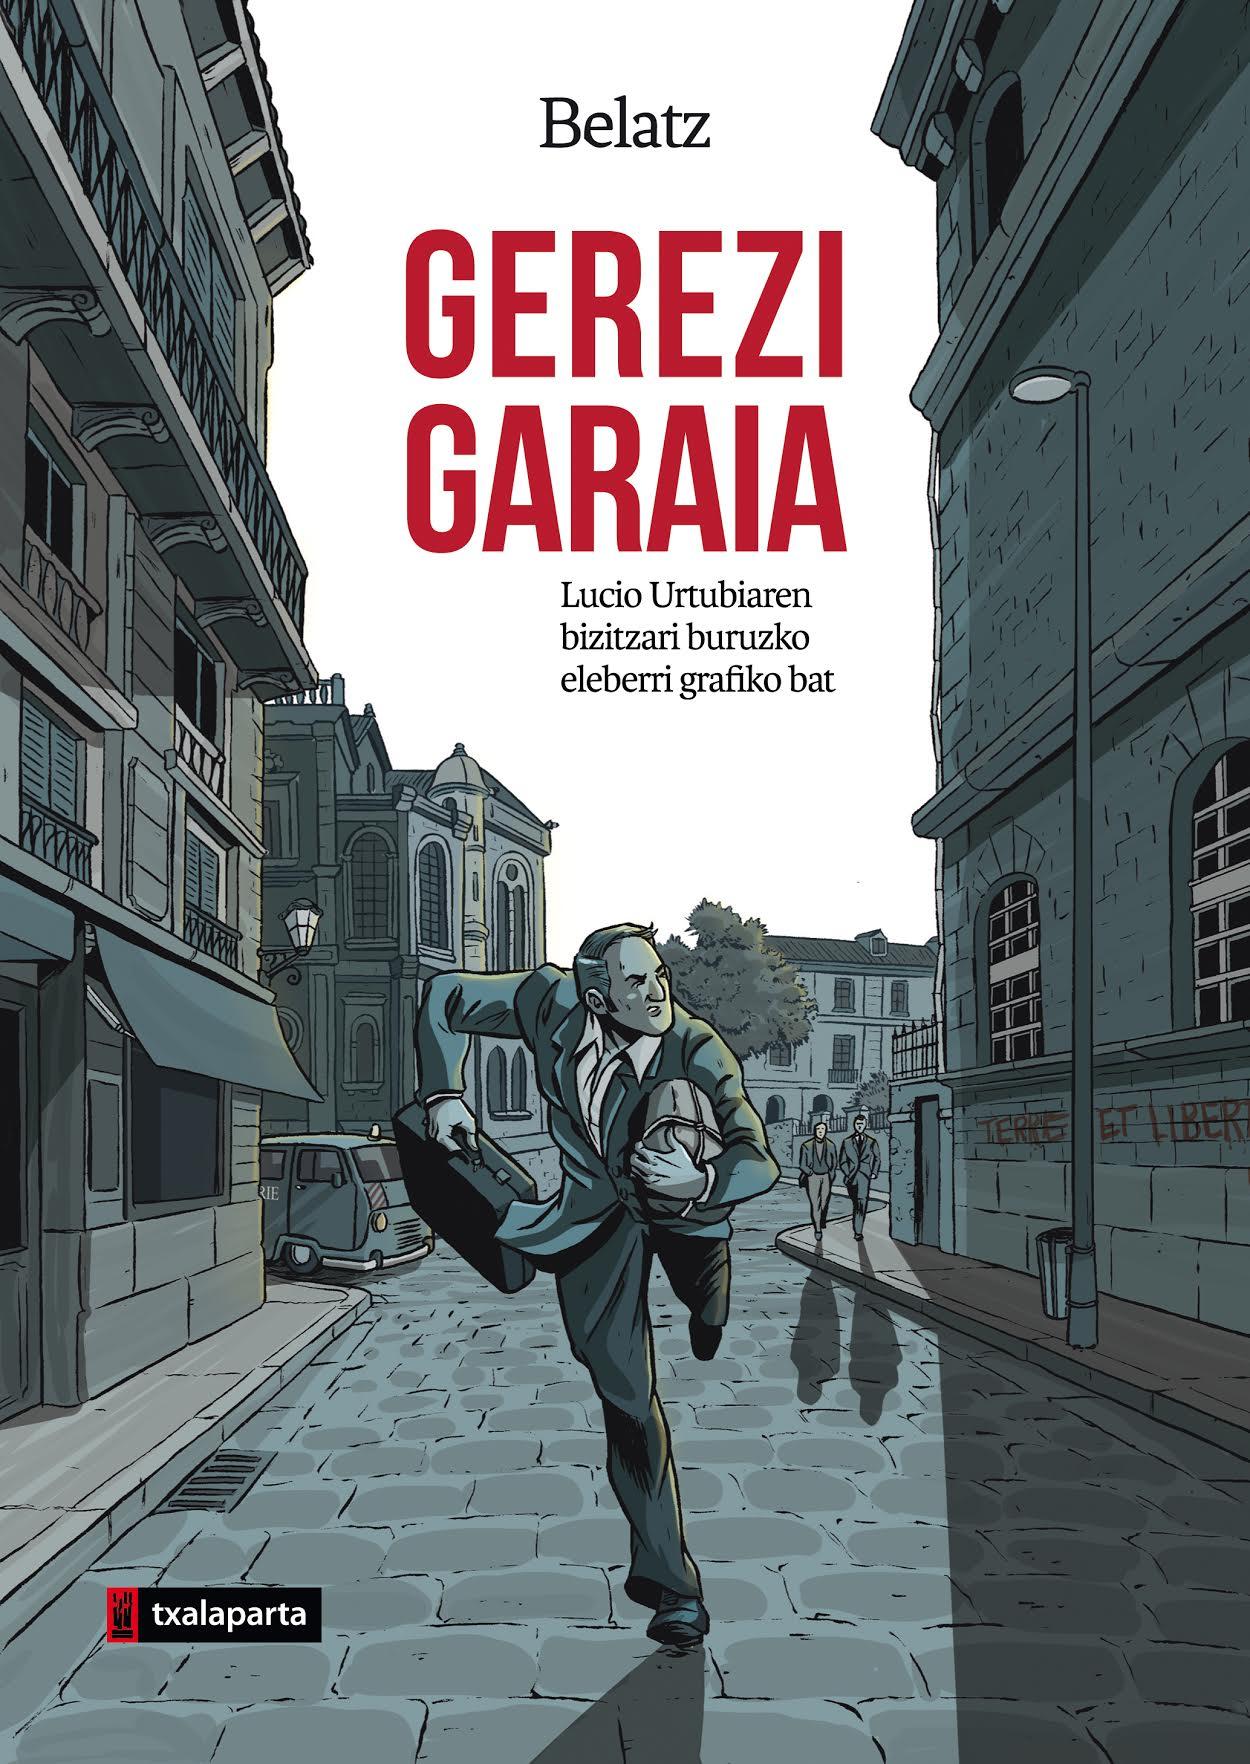 Gerezi garaia - Mikel Santos 'Belatz' - txalaparta.eus